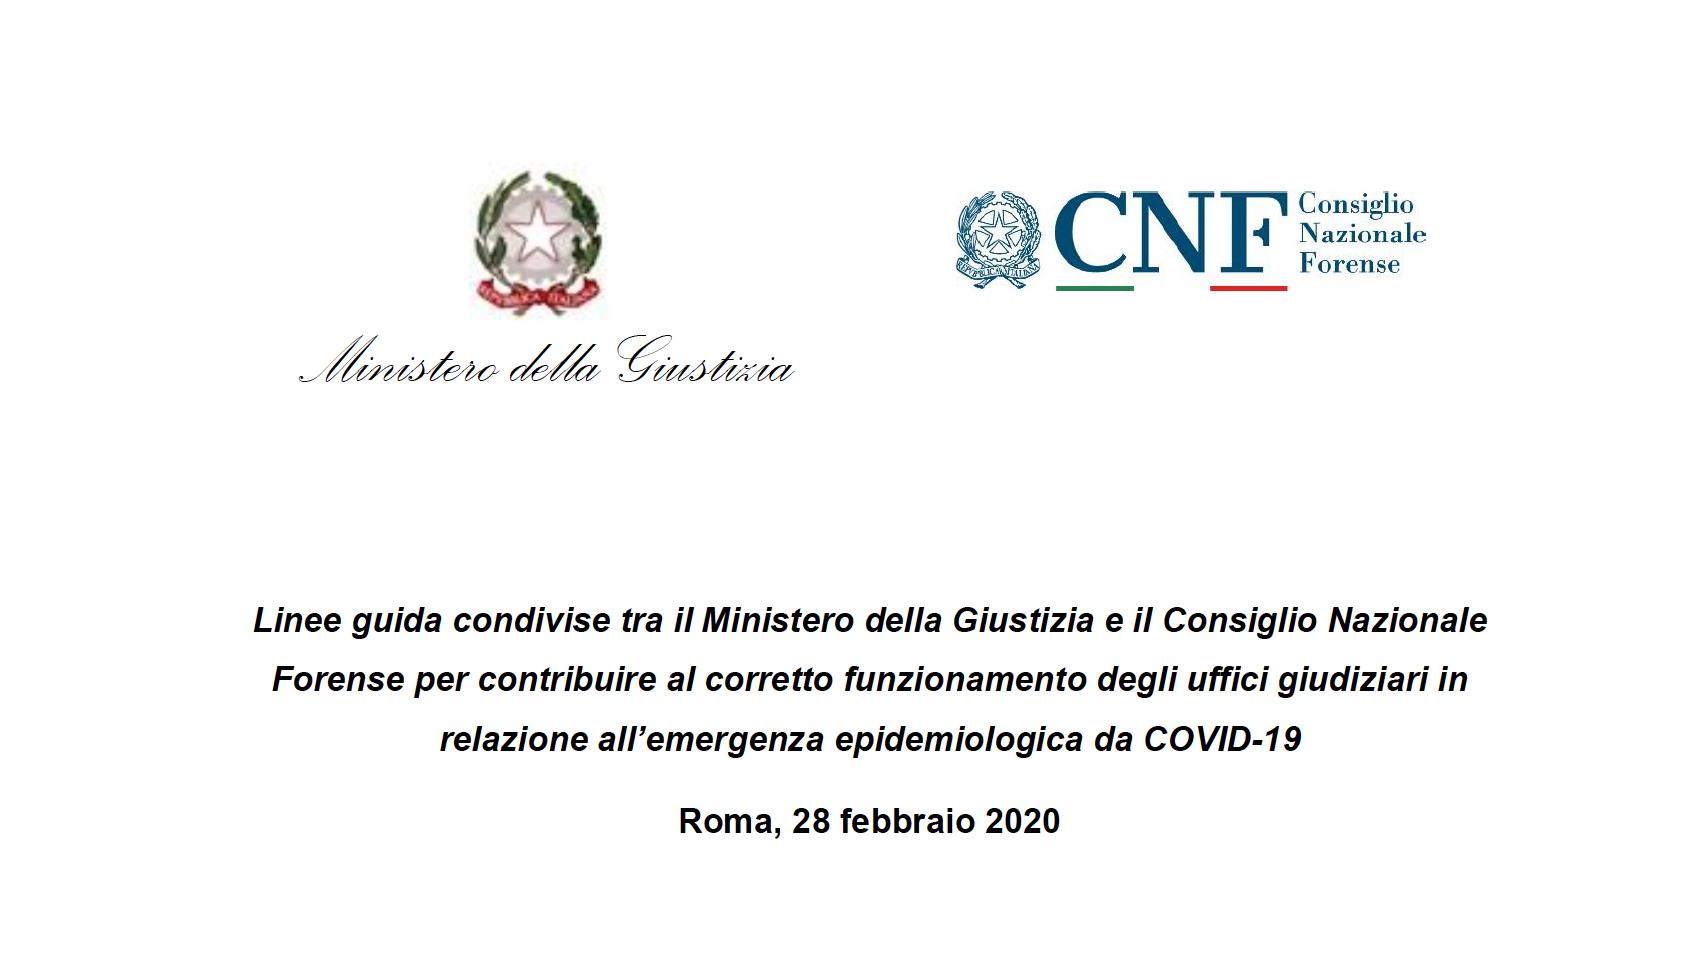 Coronavirus: Ministero e Cnf diramano linee guida